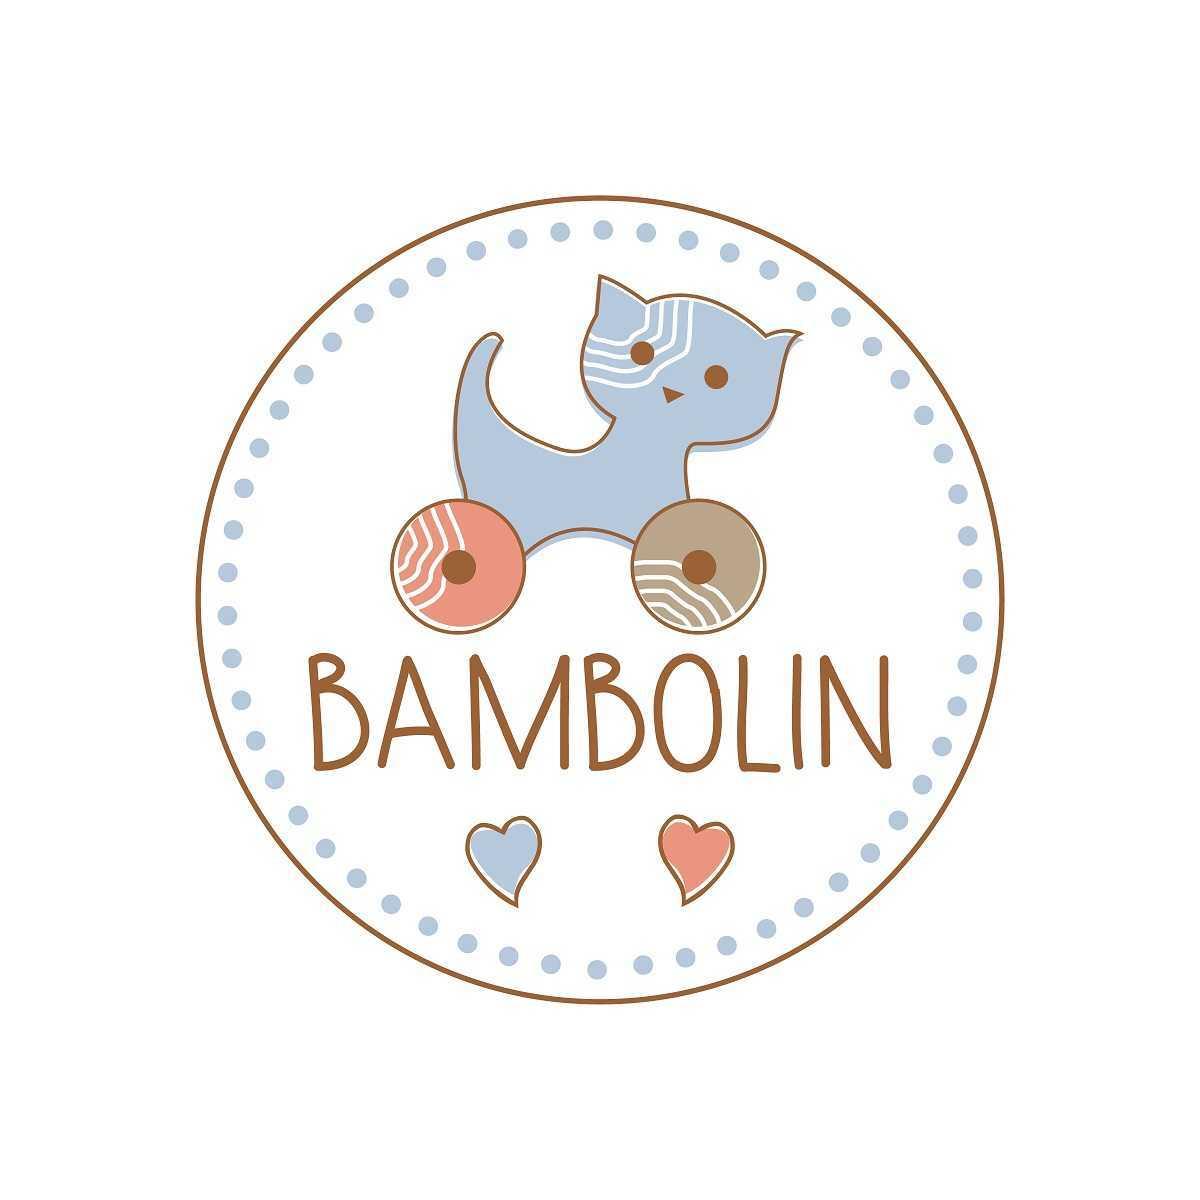 Bambolin Onlineshop